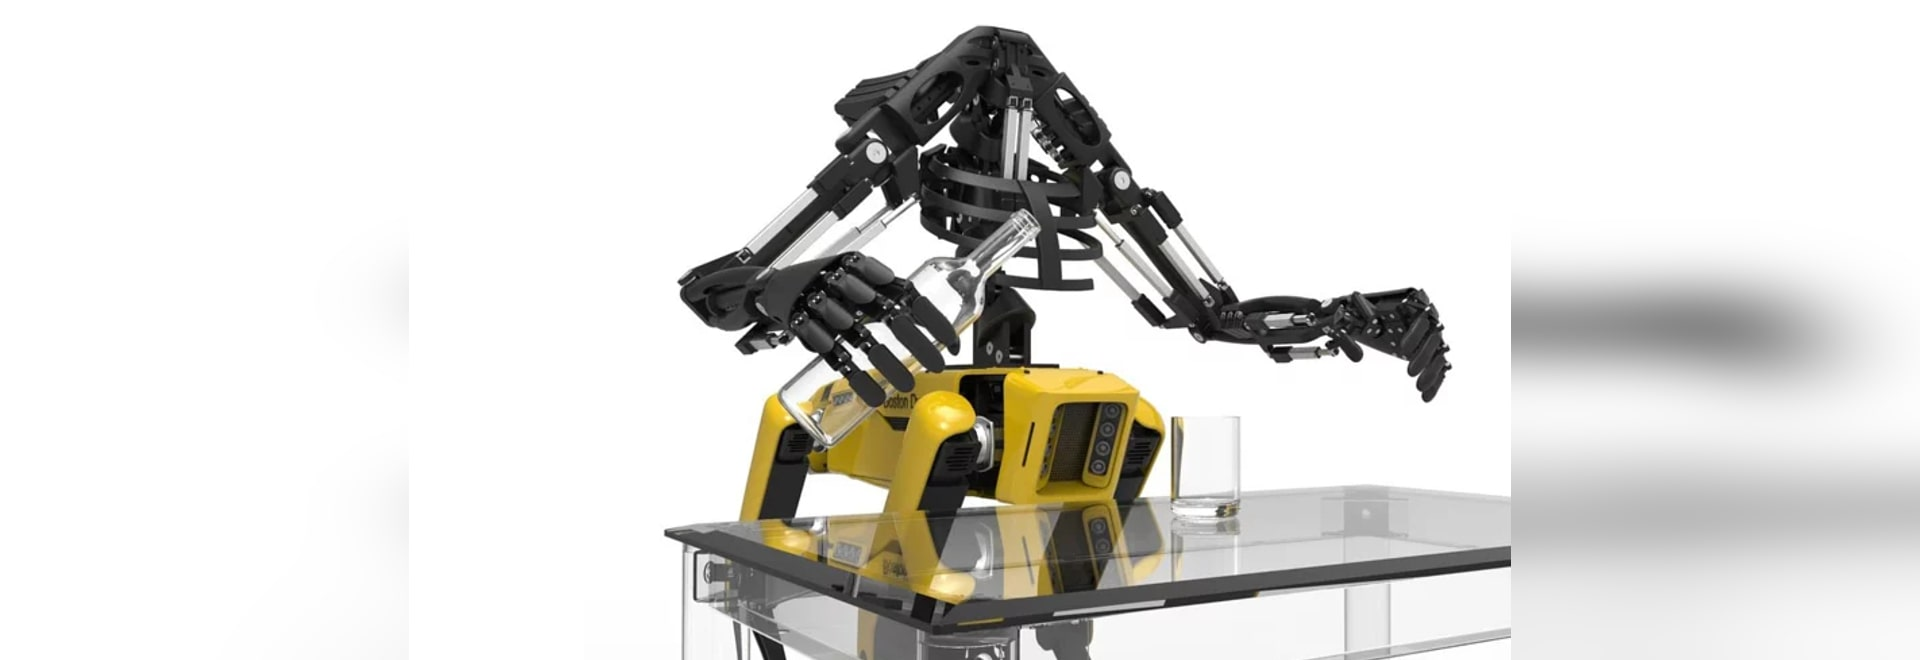 Youbionic fügt 3D bionische Druckarme Boston Dynamics-Roboterhund SpotMini hinzu